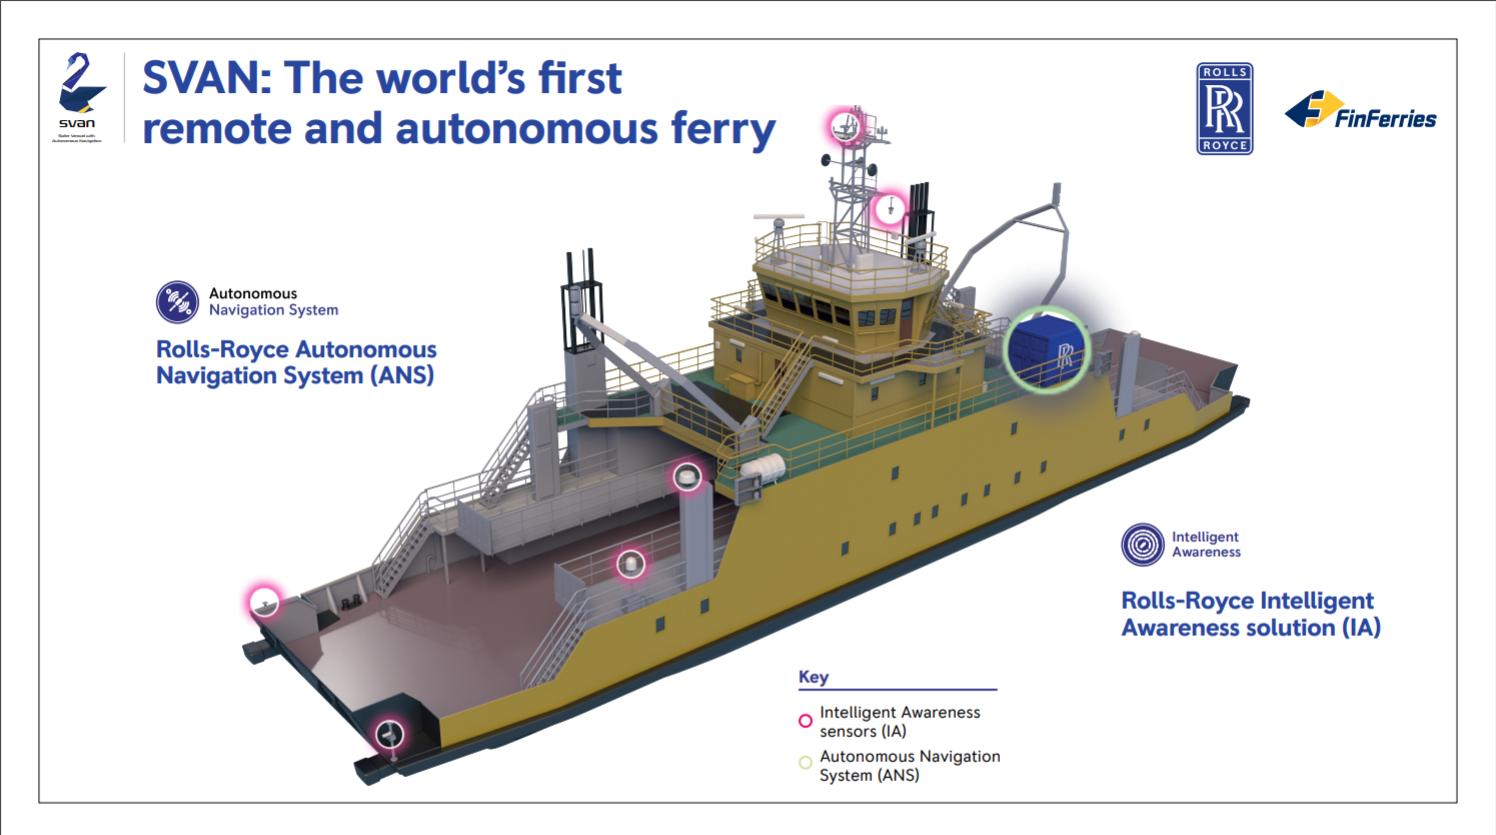 Falco Rolls-Royce and FinFerries' autonomous passenger ferry